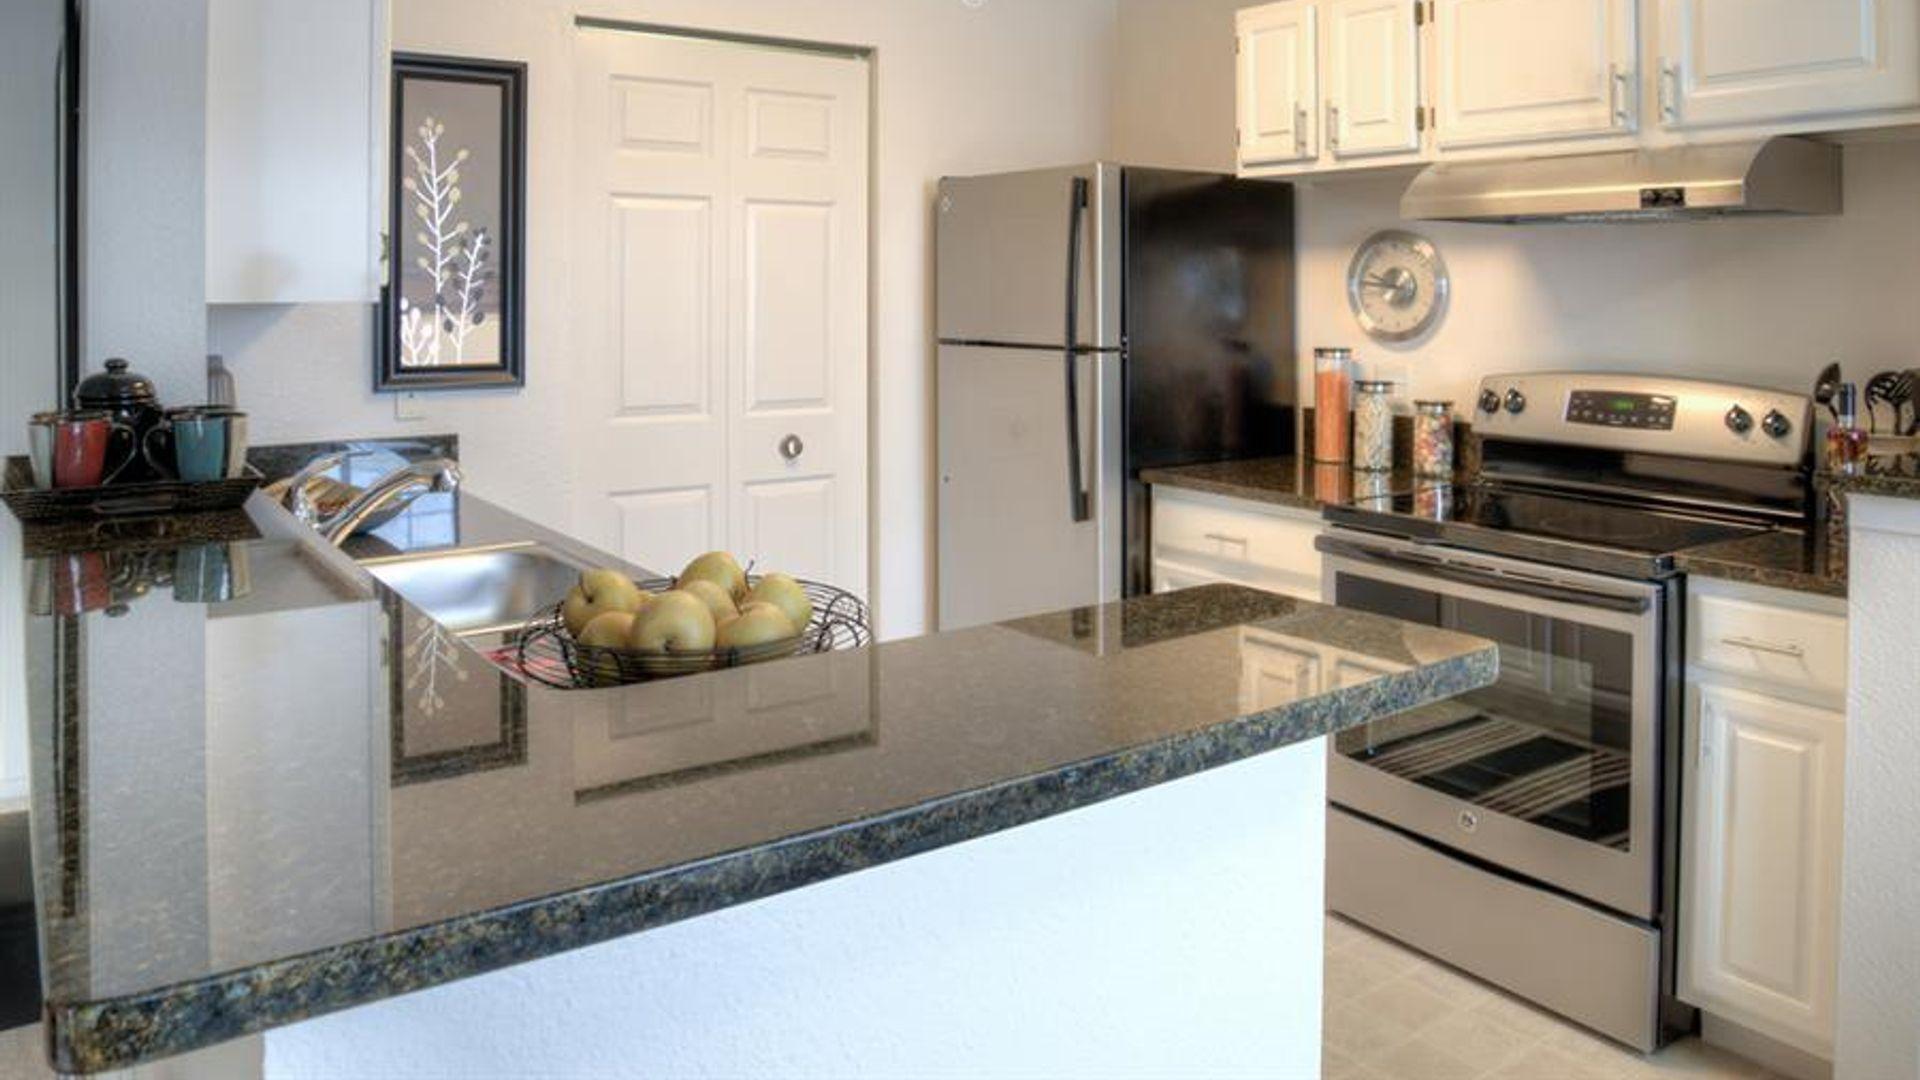 1 bed apartment at 333 Jackson Plaza, Ann Arbor, MI 48103 ...